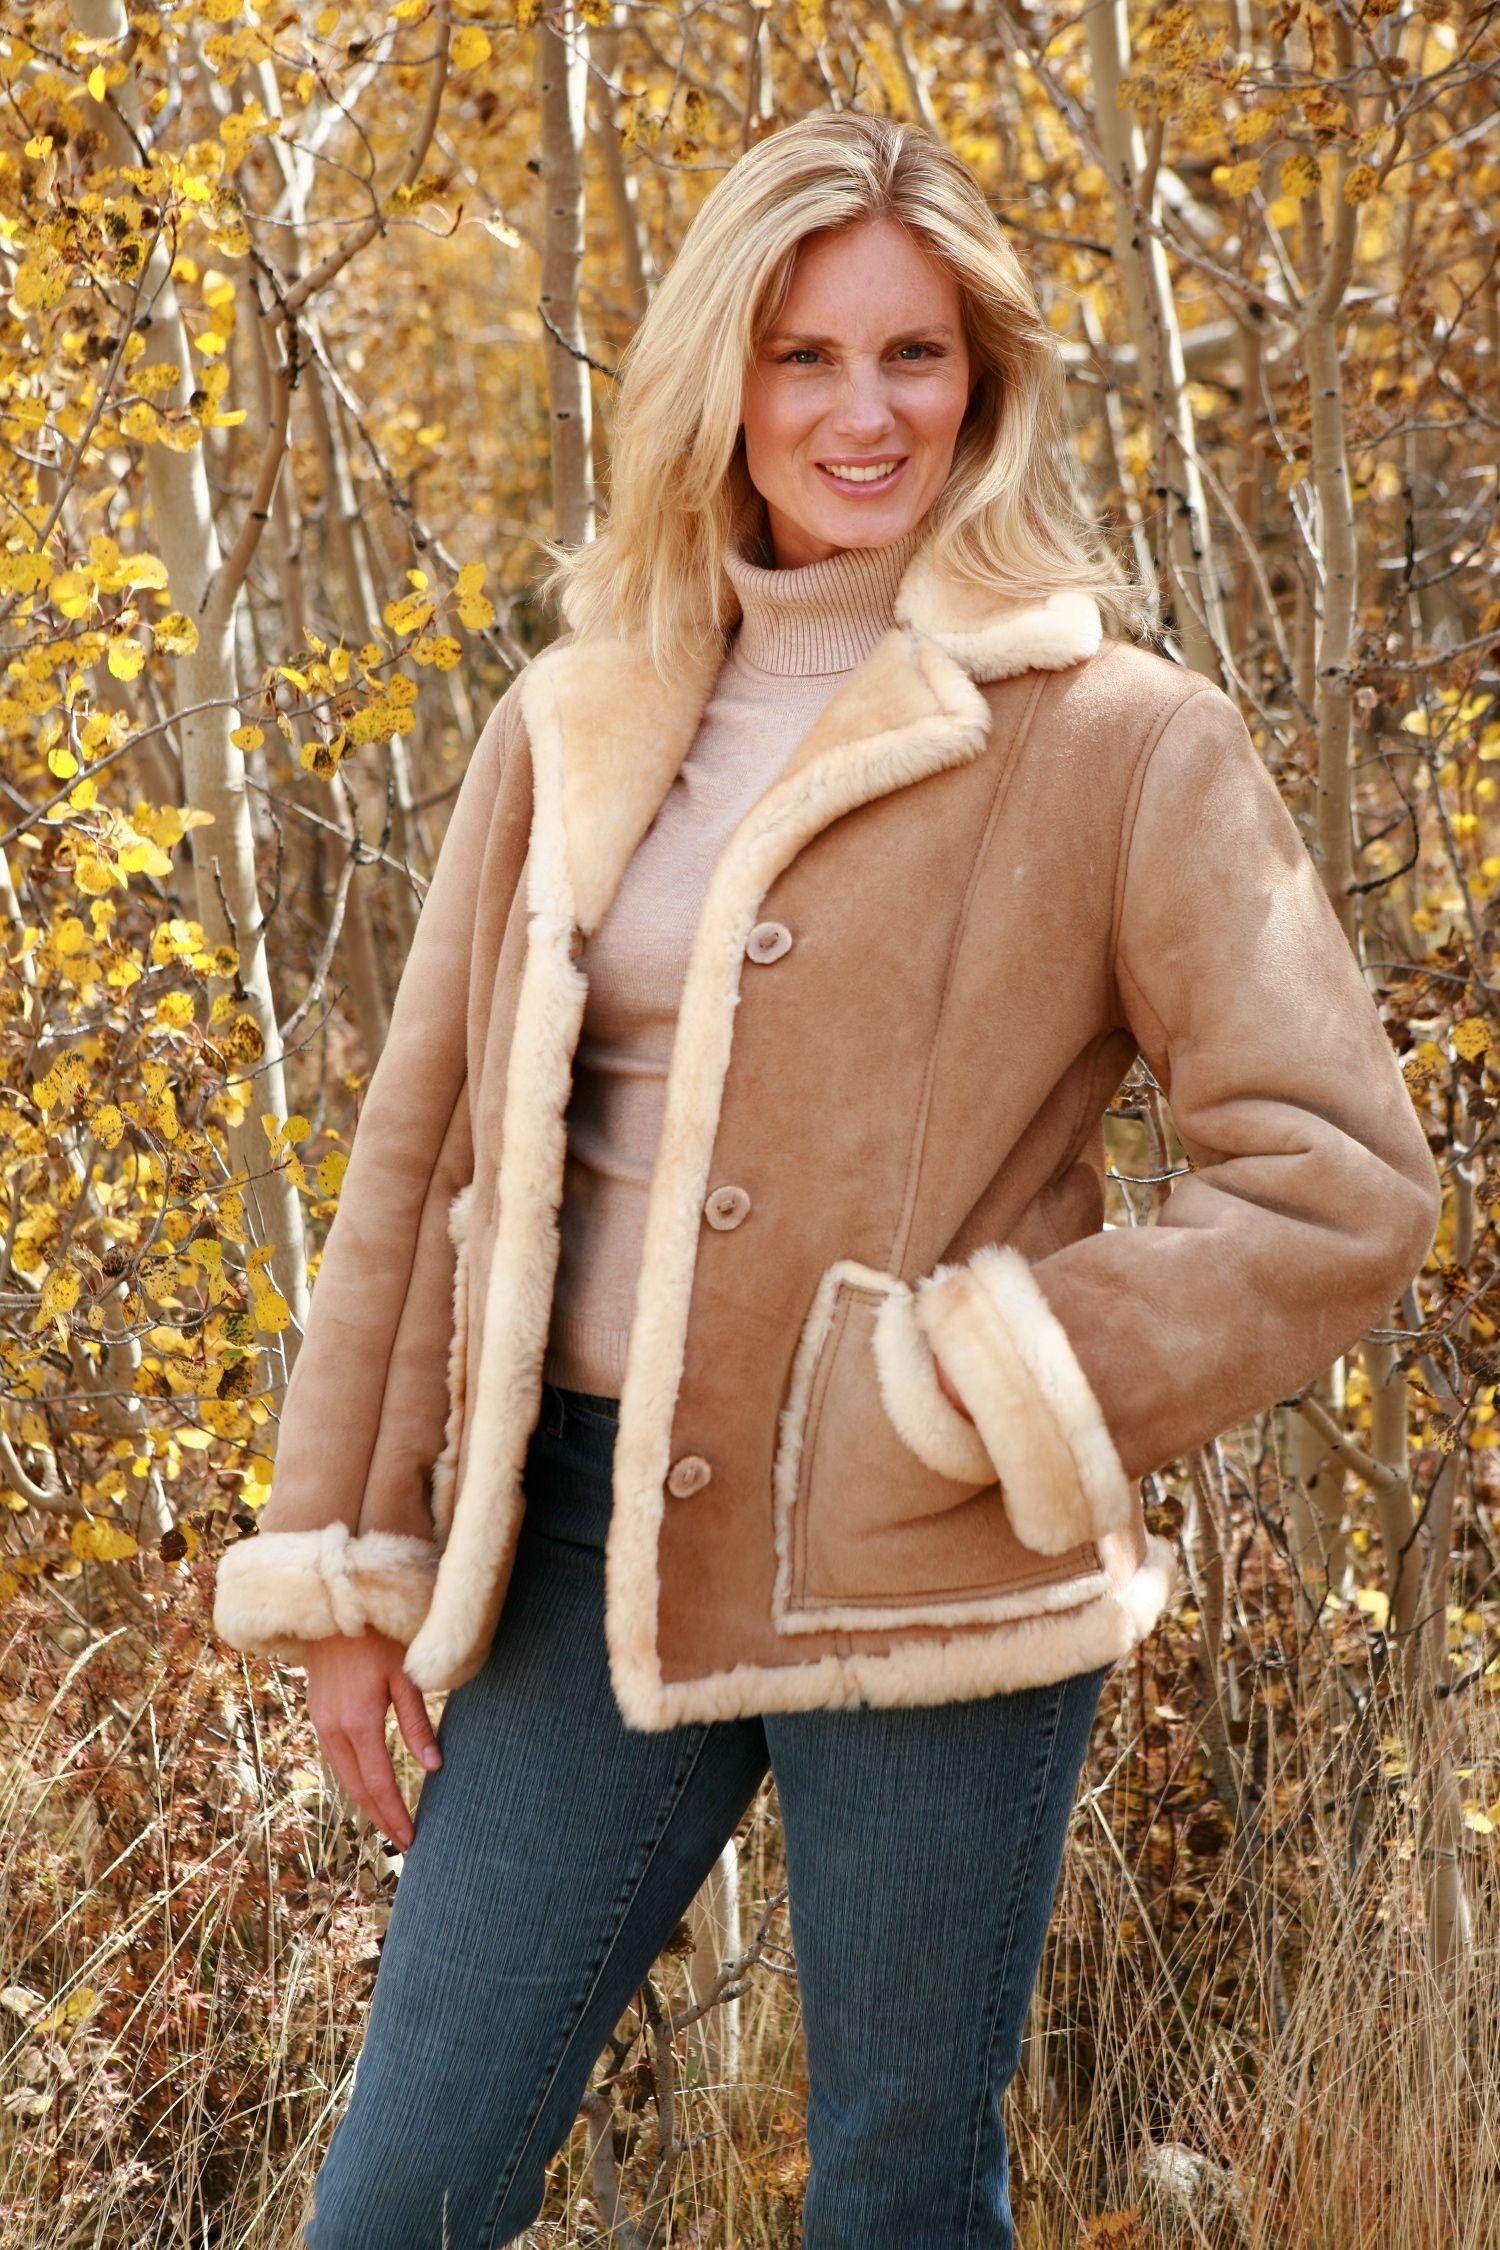 Image detail for Ladies Sheepskin Coat Shearling